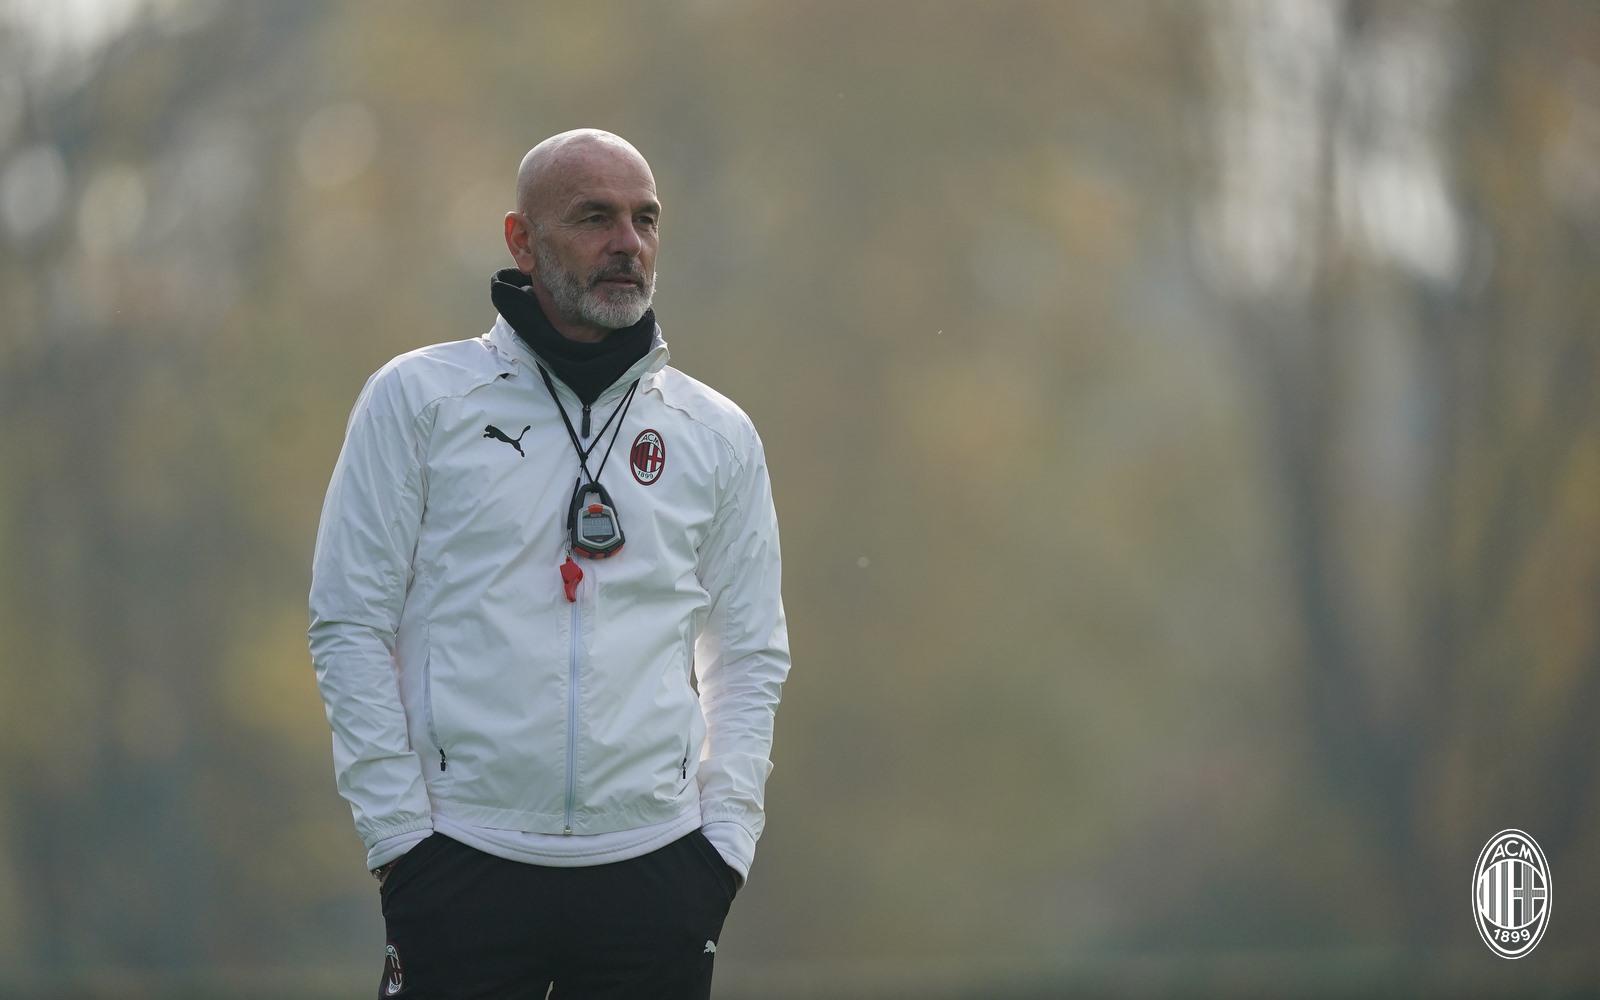 إصابة سطيفانو بيولي مدرب ميلانو بفيروس كورونا